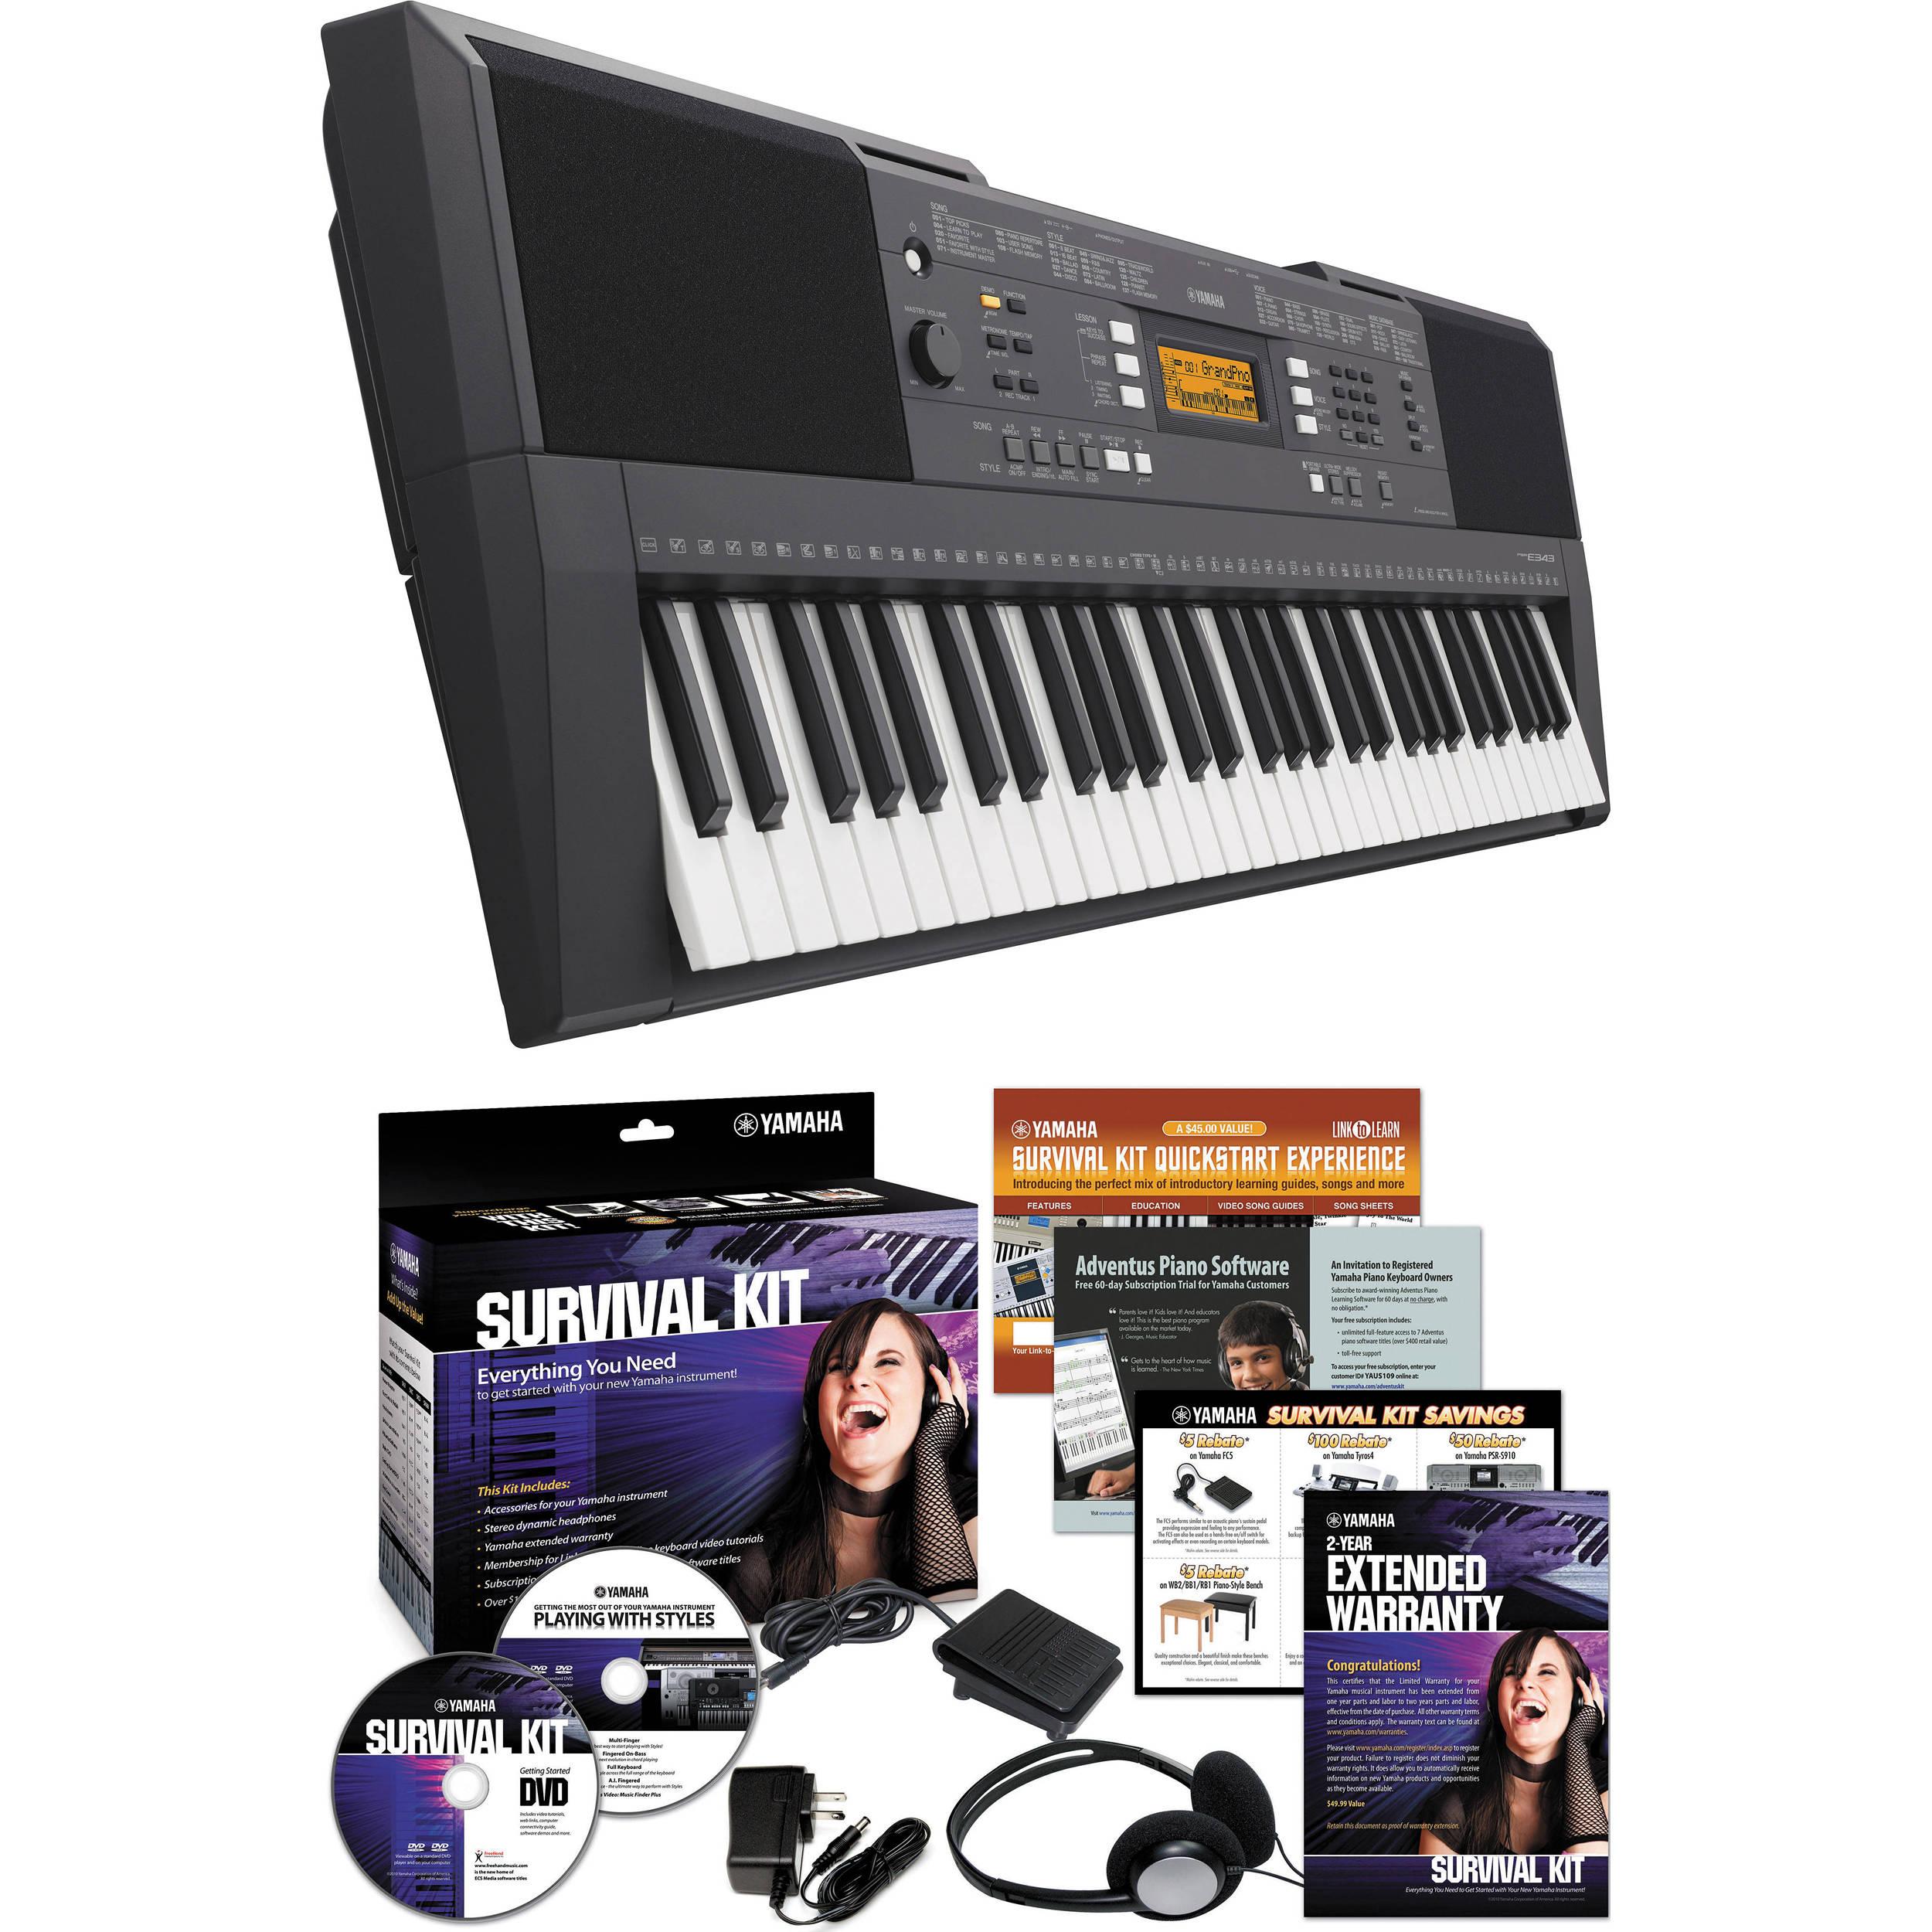 Yamaha survival kit keyboard